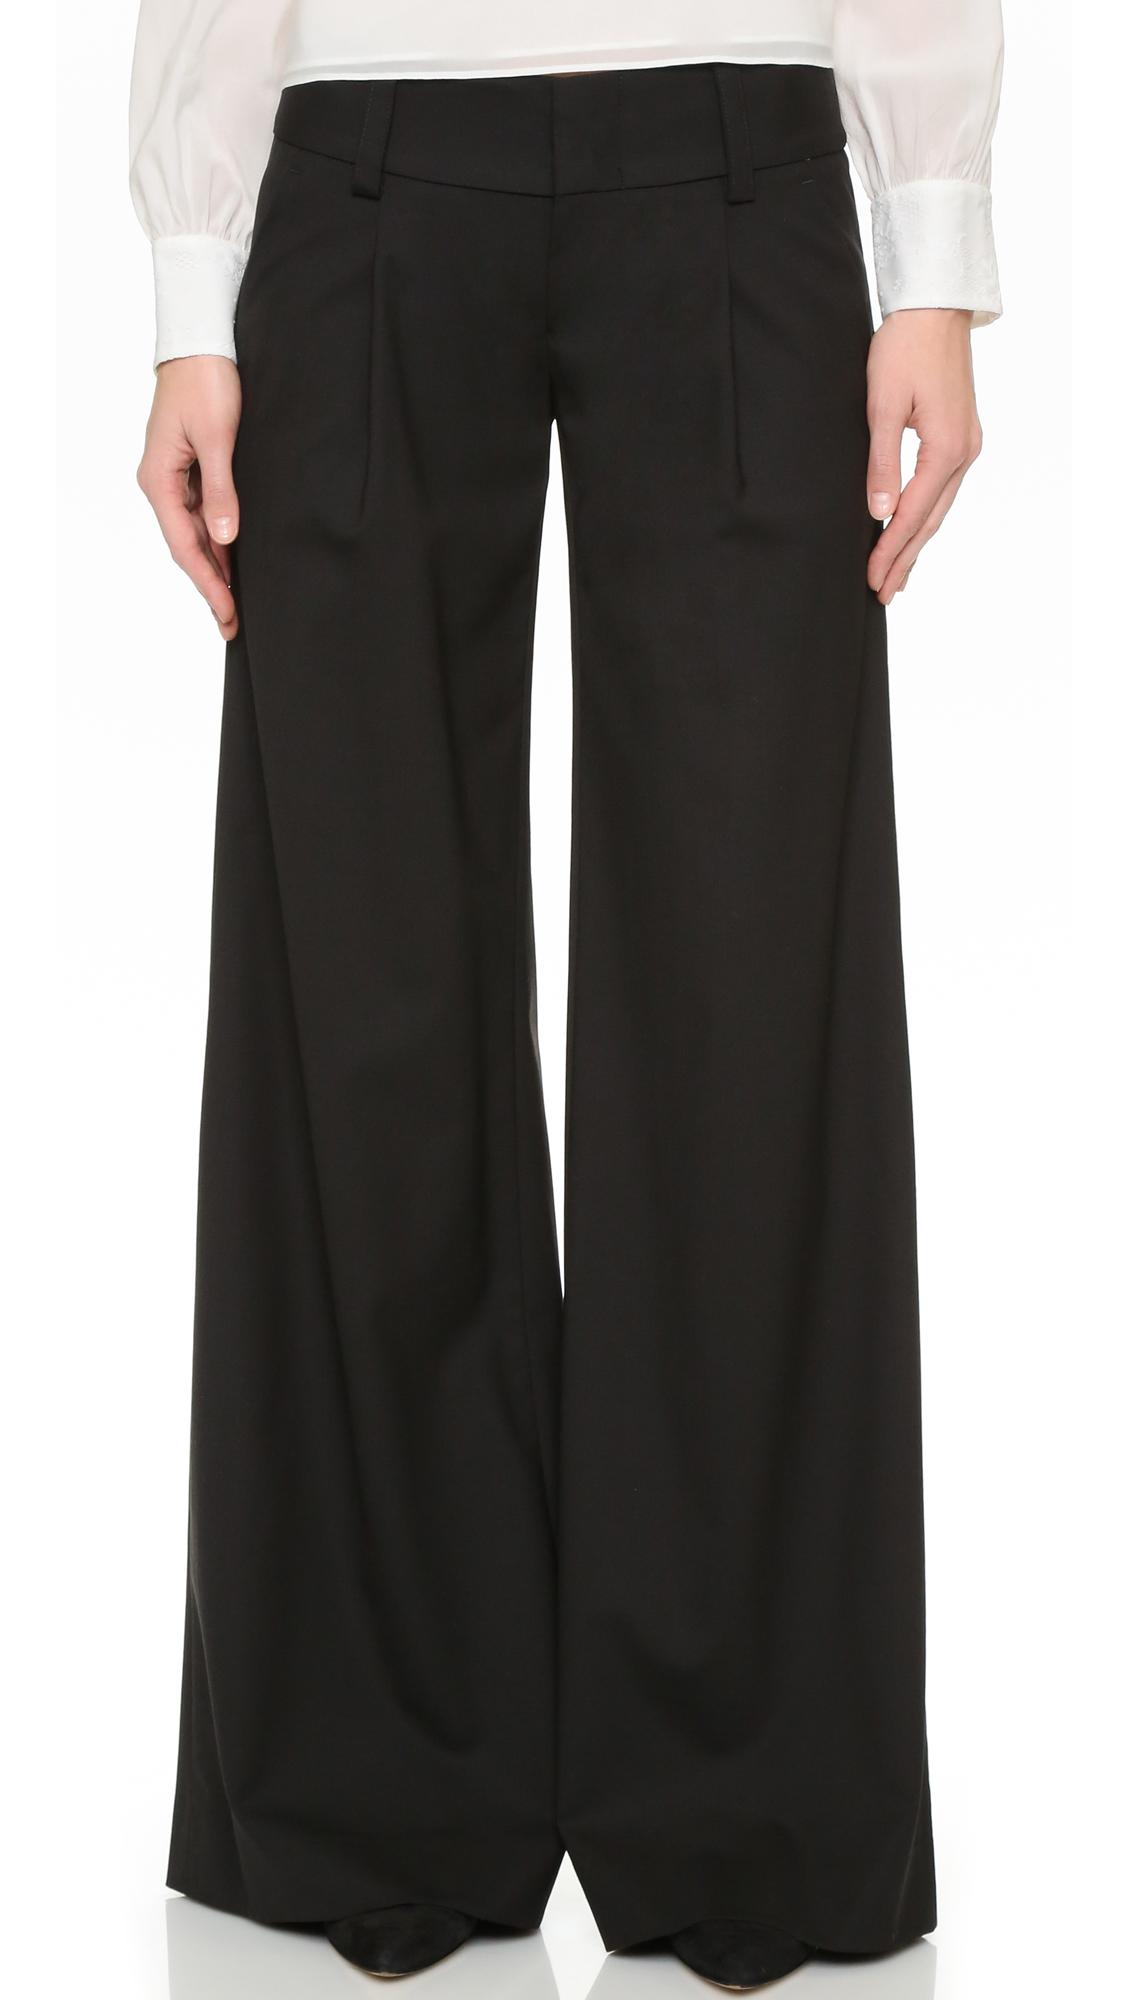 Alice + Olivia Eric Front Pleat Wide Leg Pants - Black at Shopbop